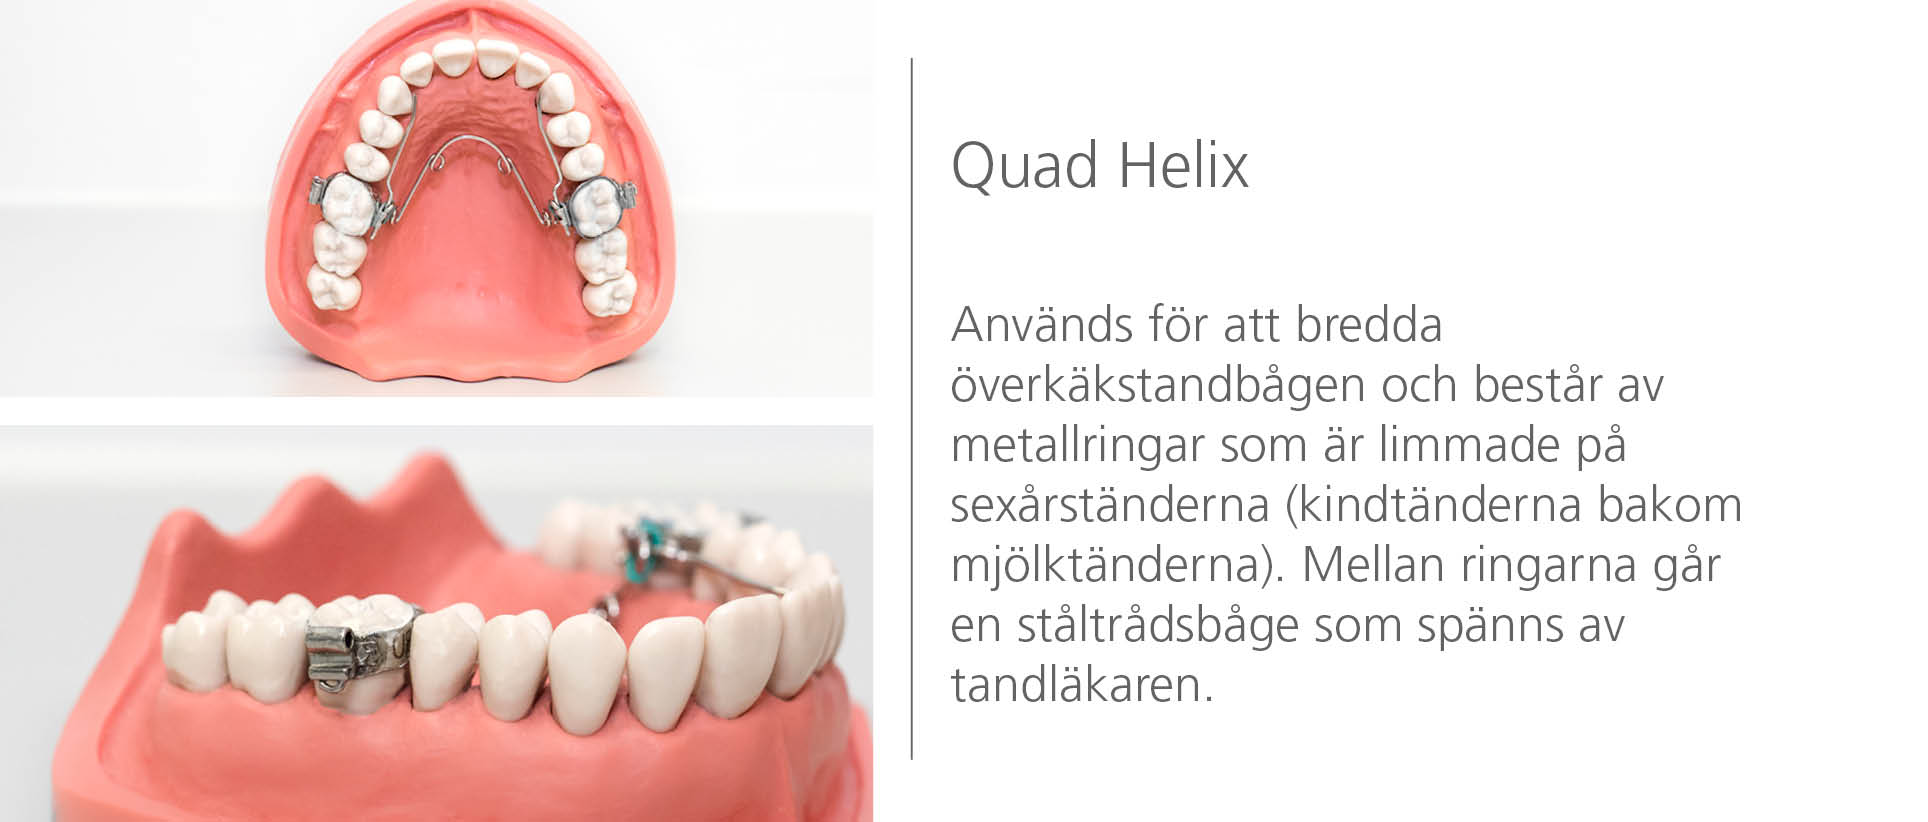 Orala tekniker